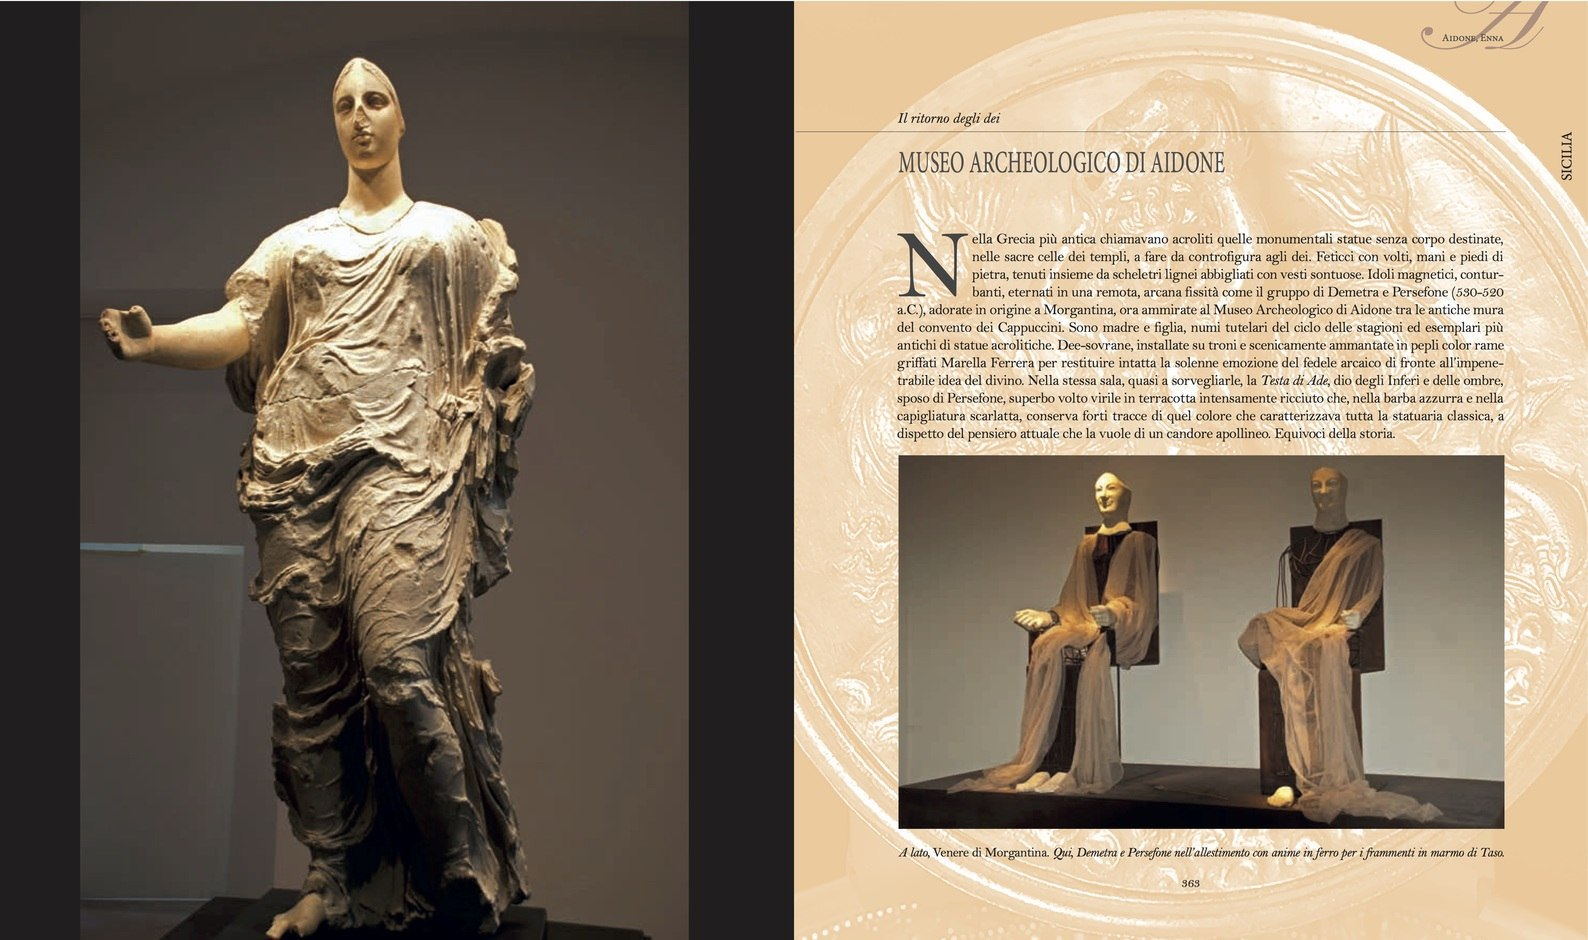 Aidone. Museo archeologico di Aidone